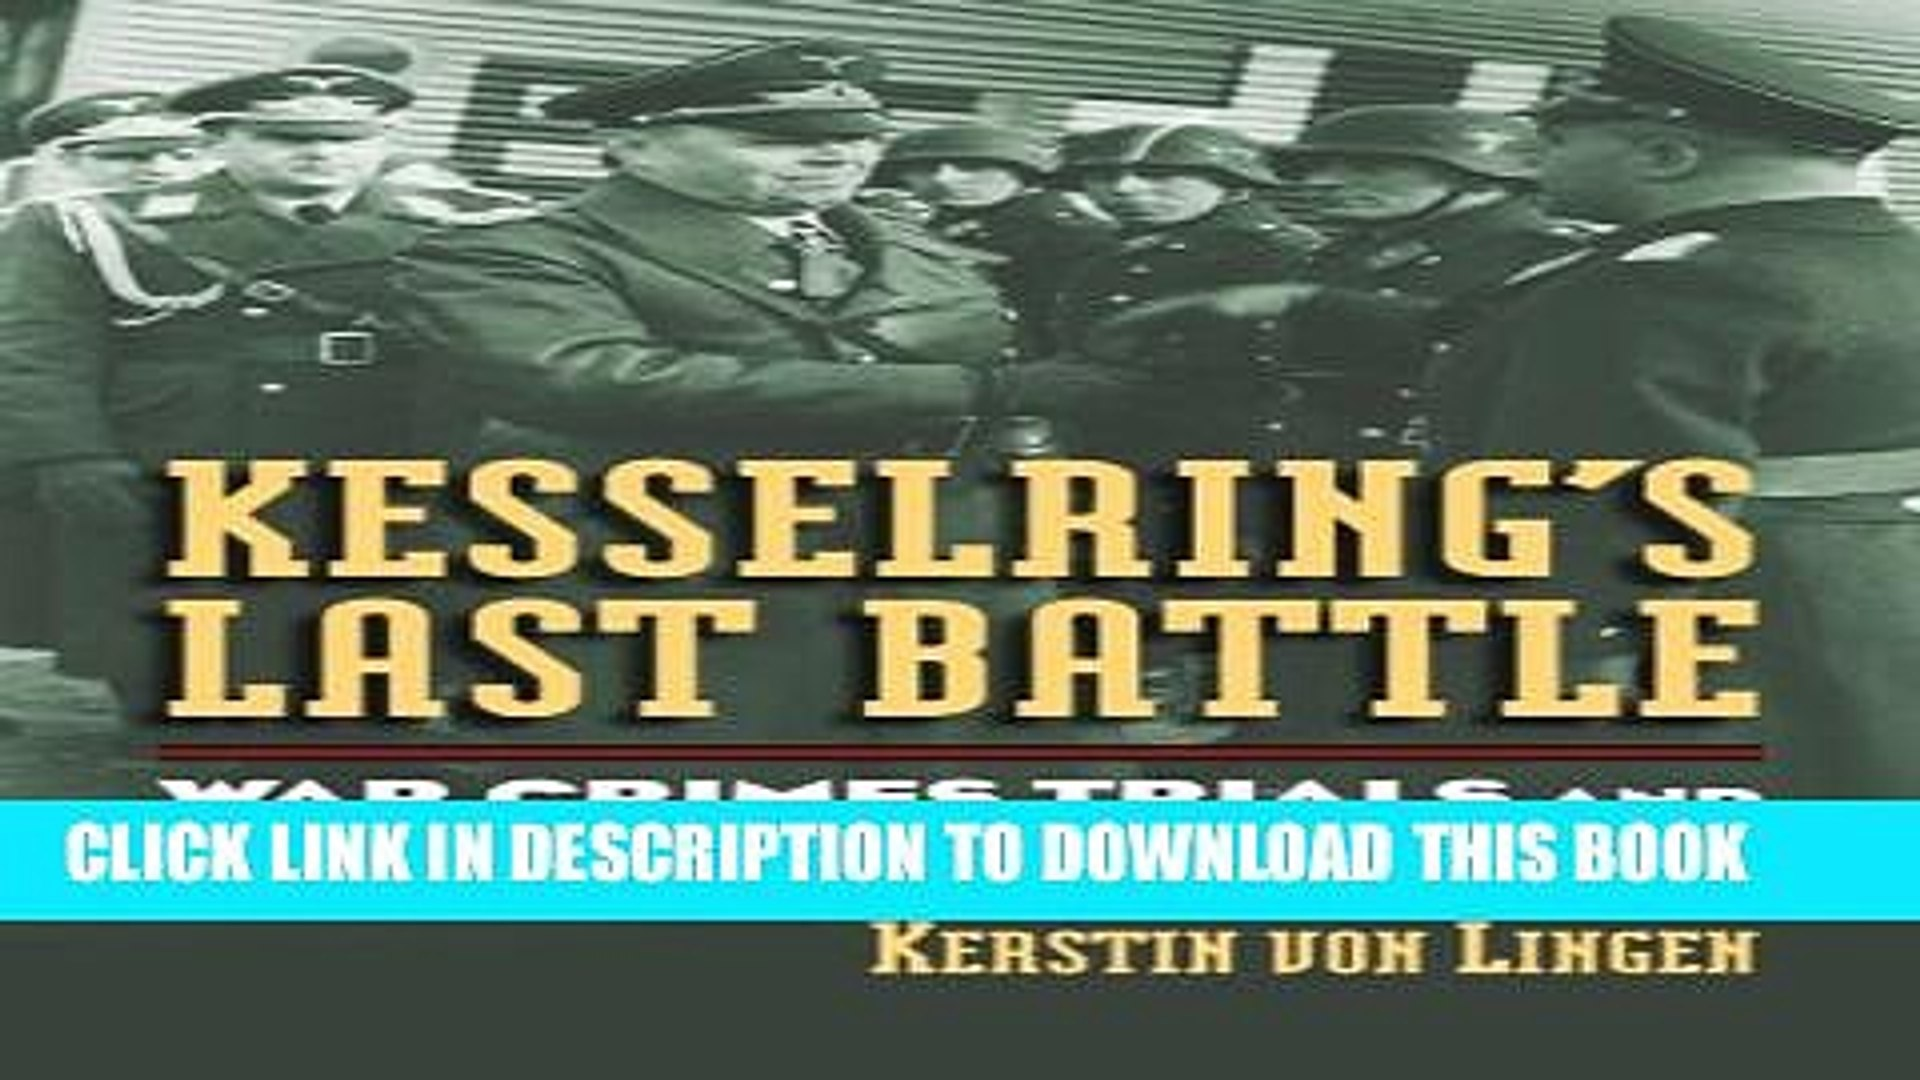 [PDF] Kesselring s Last Battle: War Crimes Trials and Cold War Politics, 1945-1960 (Modern War